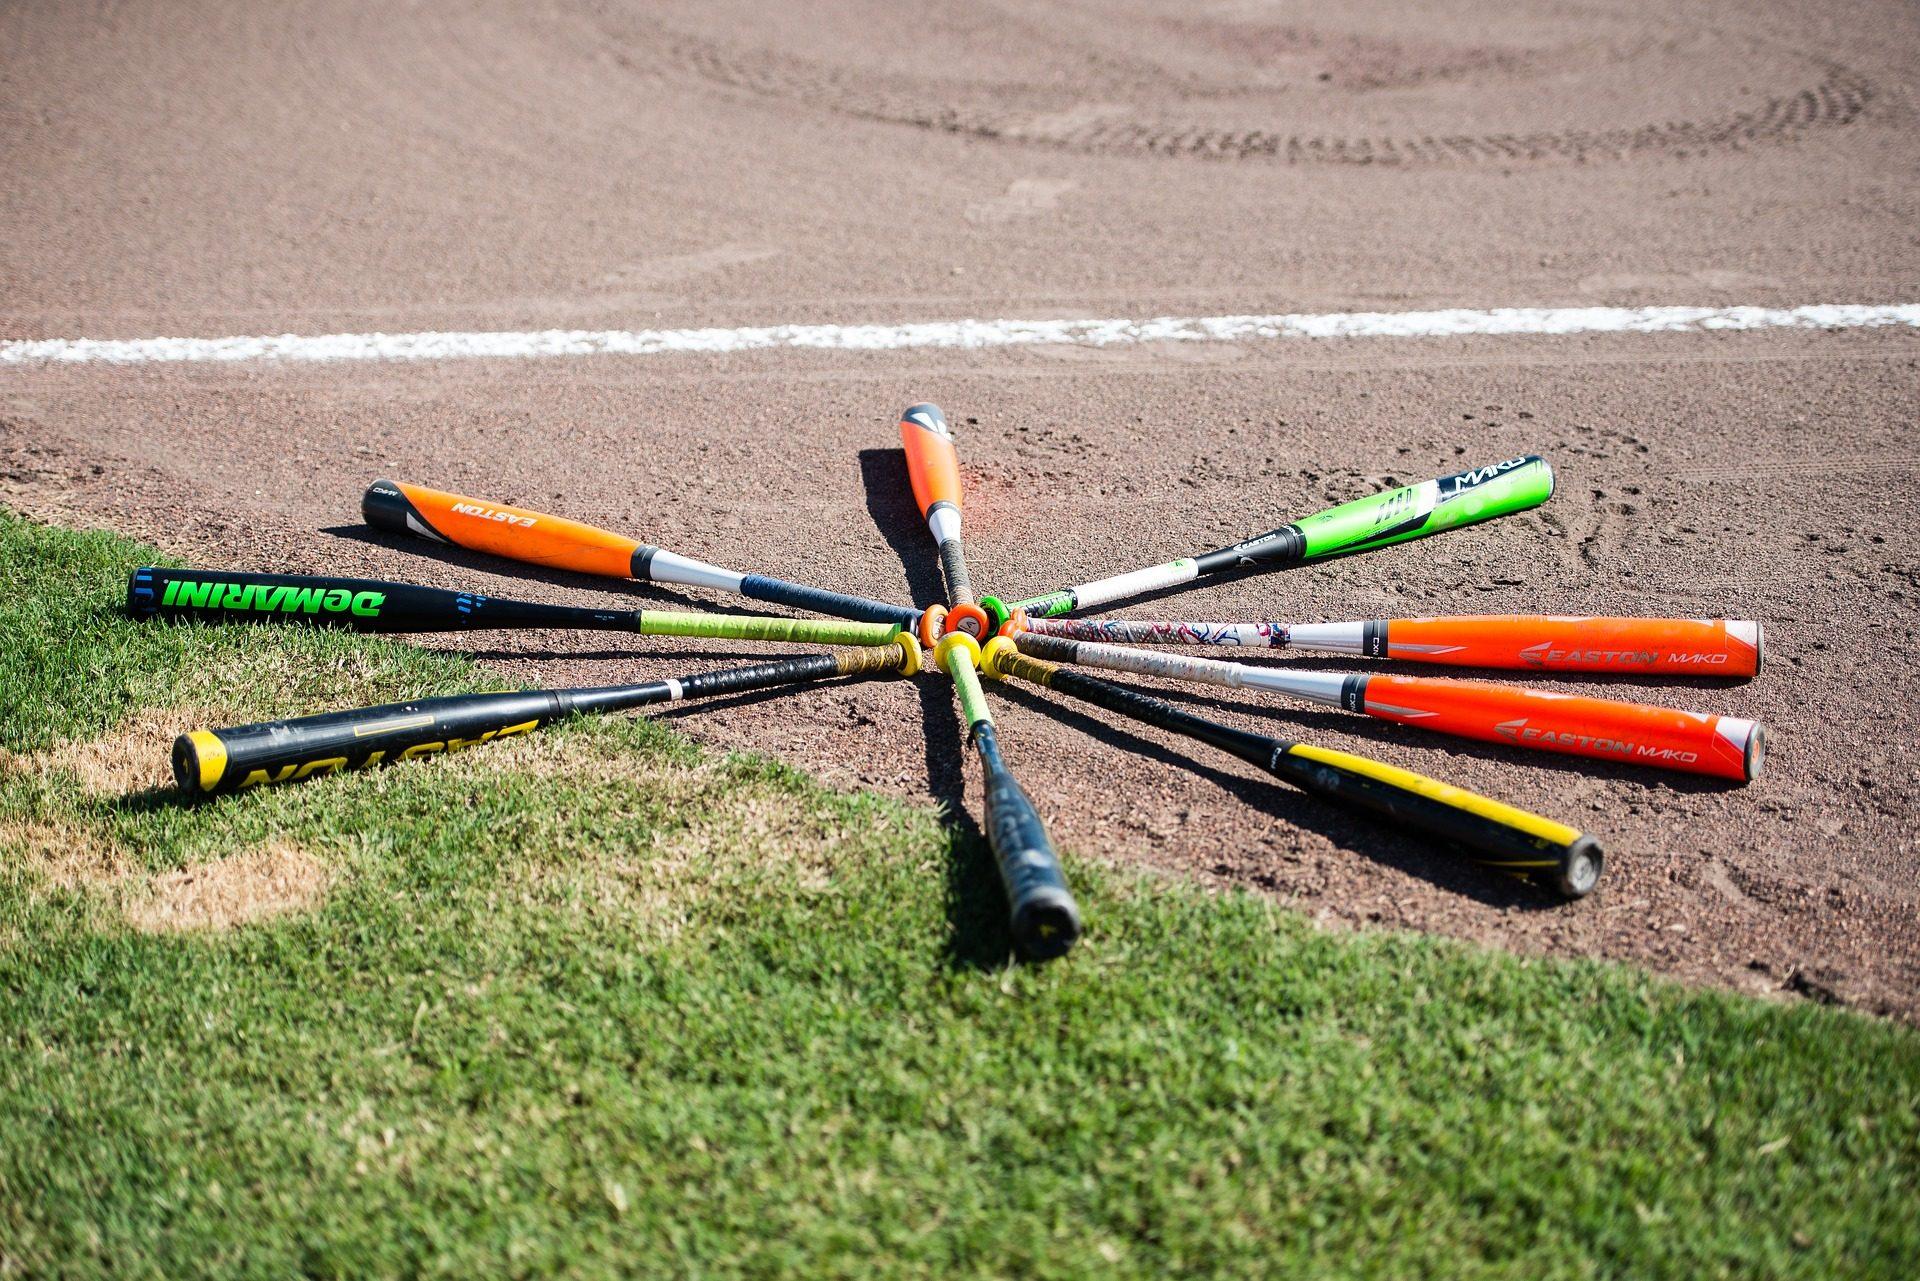 Pennsylvania School District Arming Teachers with Baseball Bats